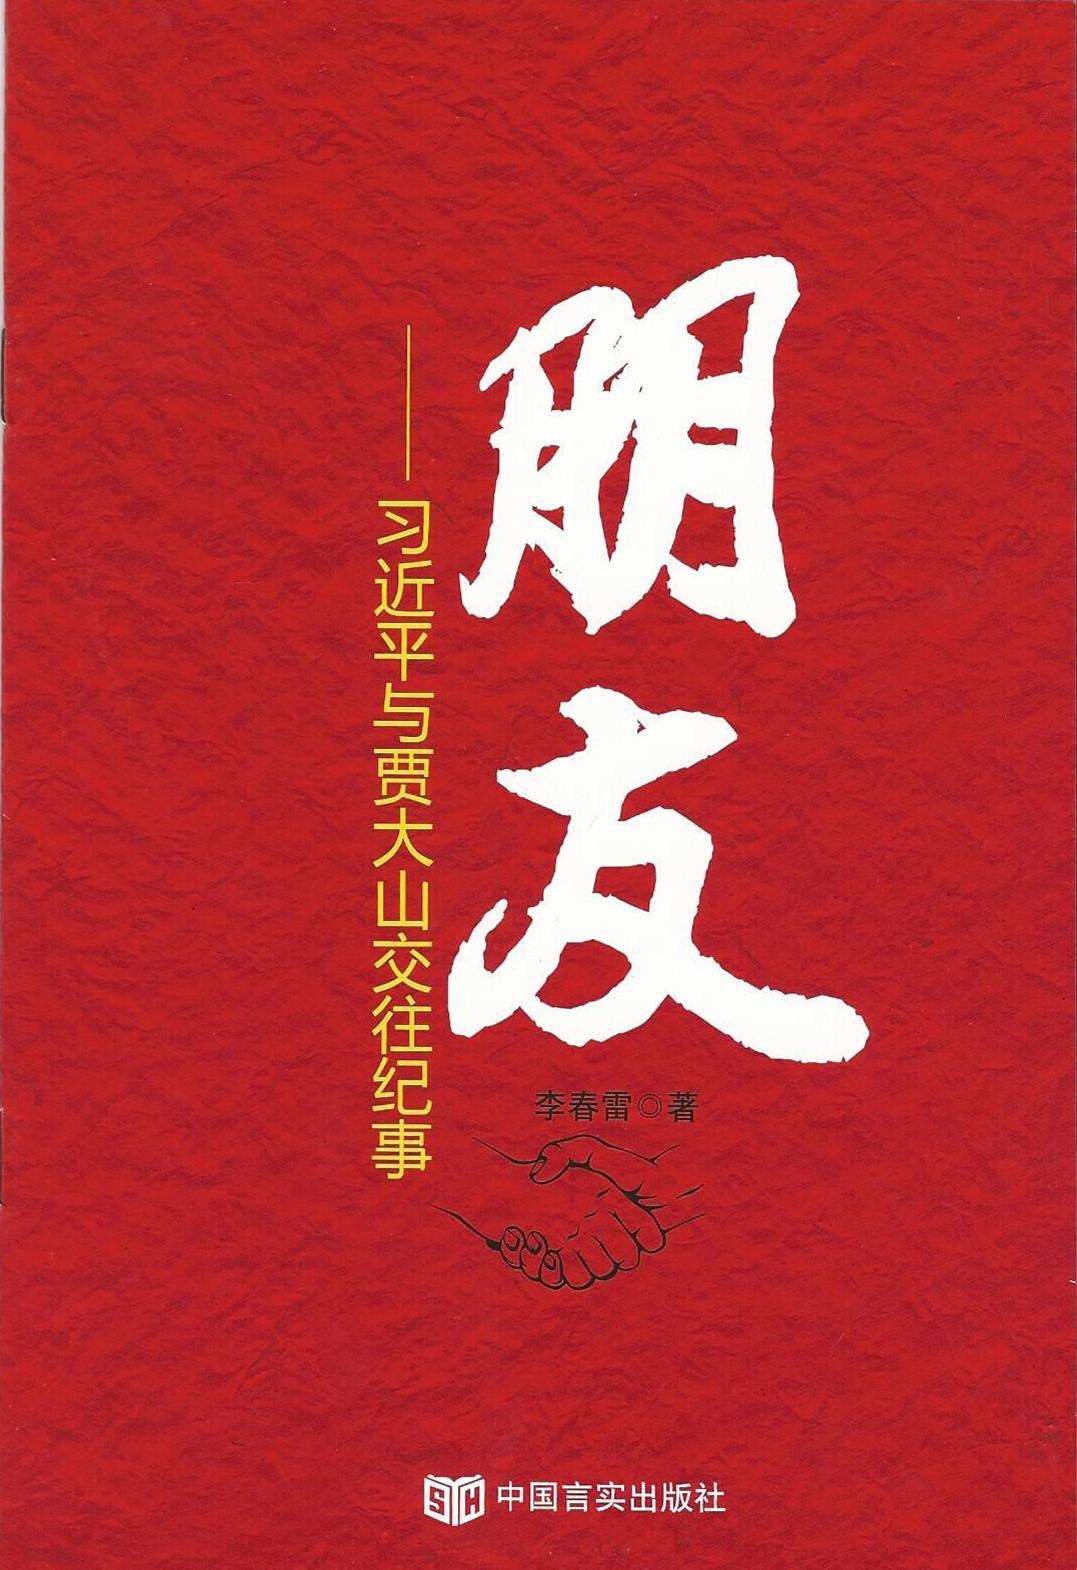 Friends: On Xi Jinpings Association with Jia Dashan 朋友-习近平与贾大山交往纪事 Li Chunlei 李春雷